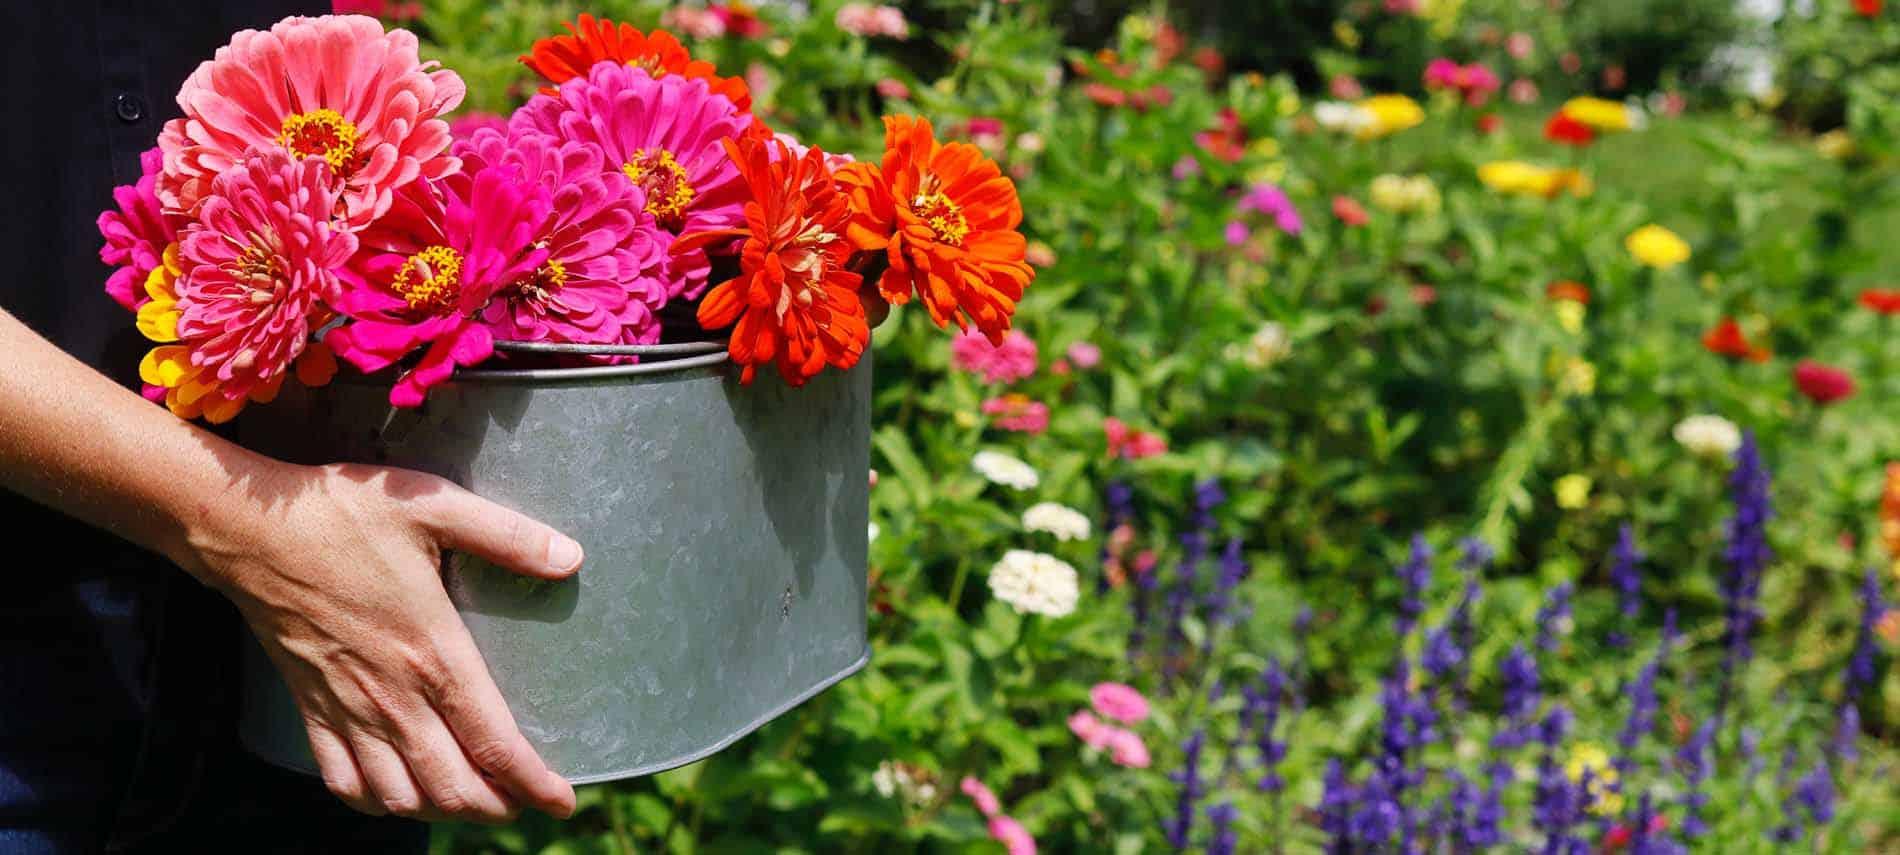 colorful garden scene woman holding steel bucket of zinnias